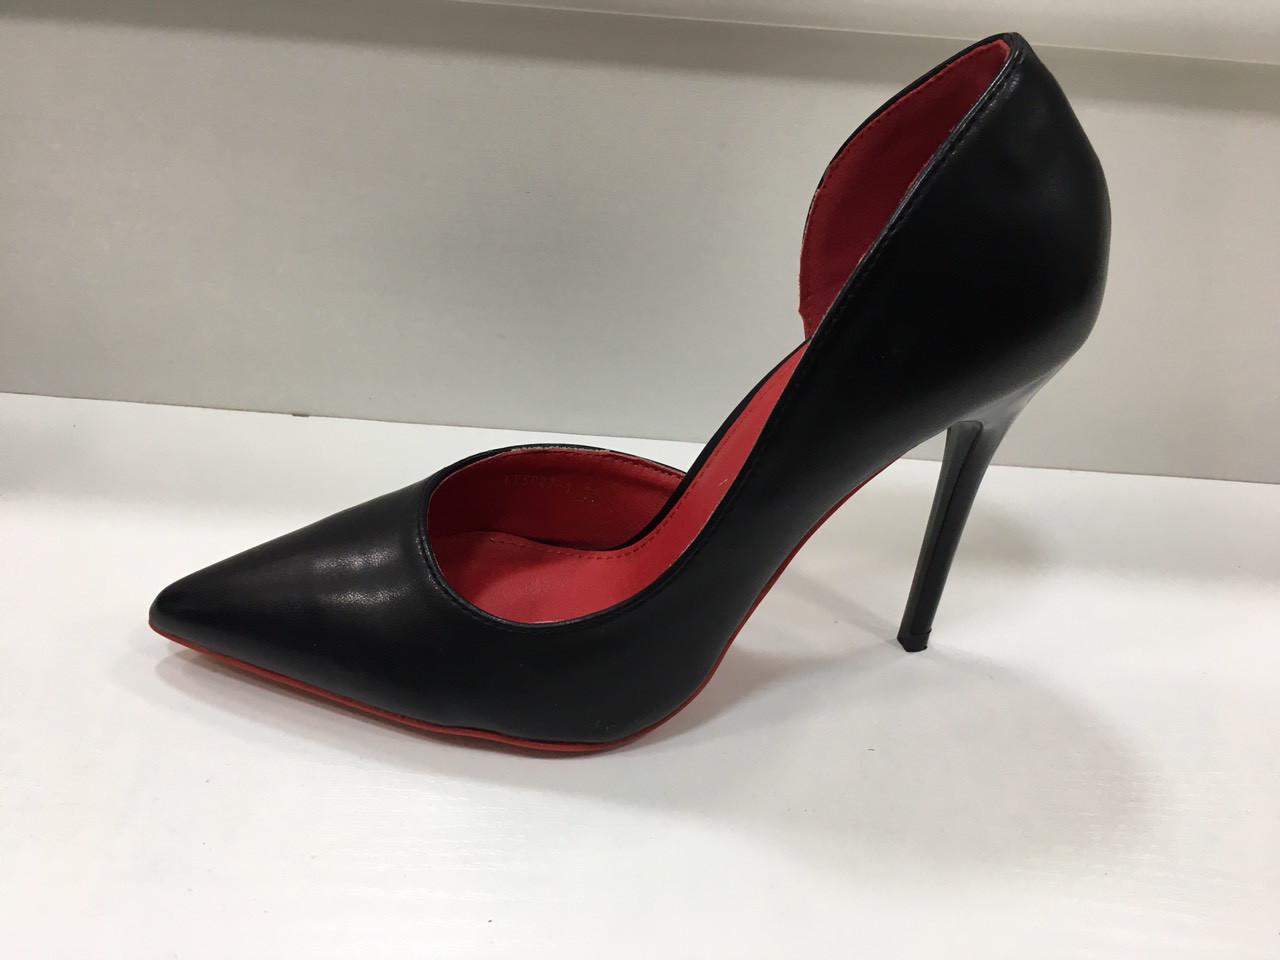 bc947e5c9 Копия Туфли лодочки открытые Zara , цена 355 грн., купить в Ужгороде —  Prom.ua (ID#770714733)